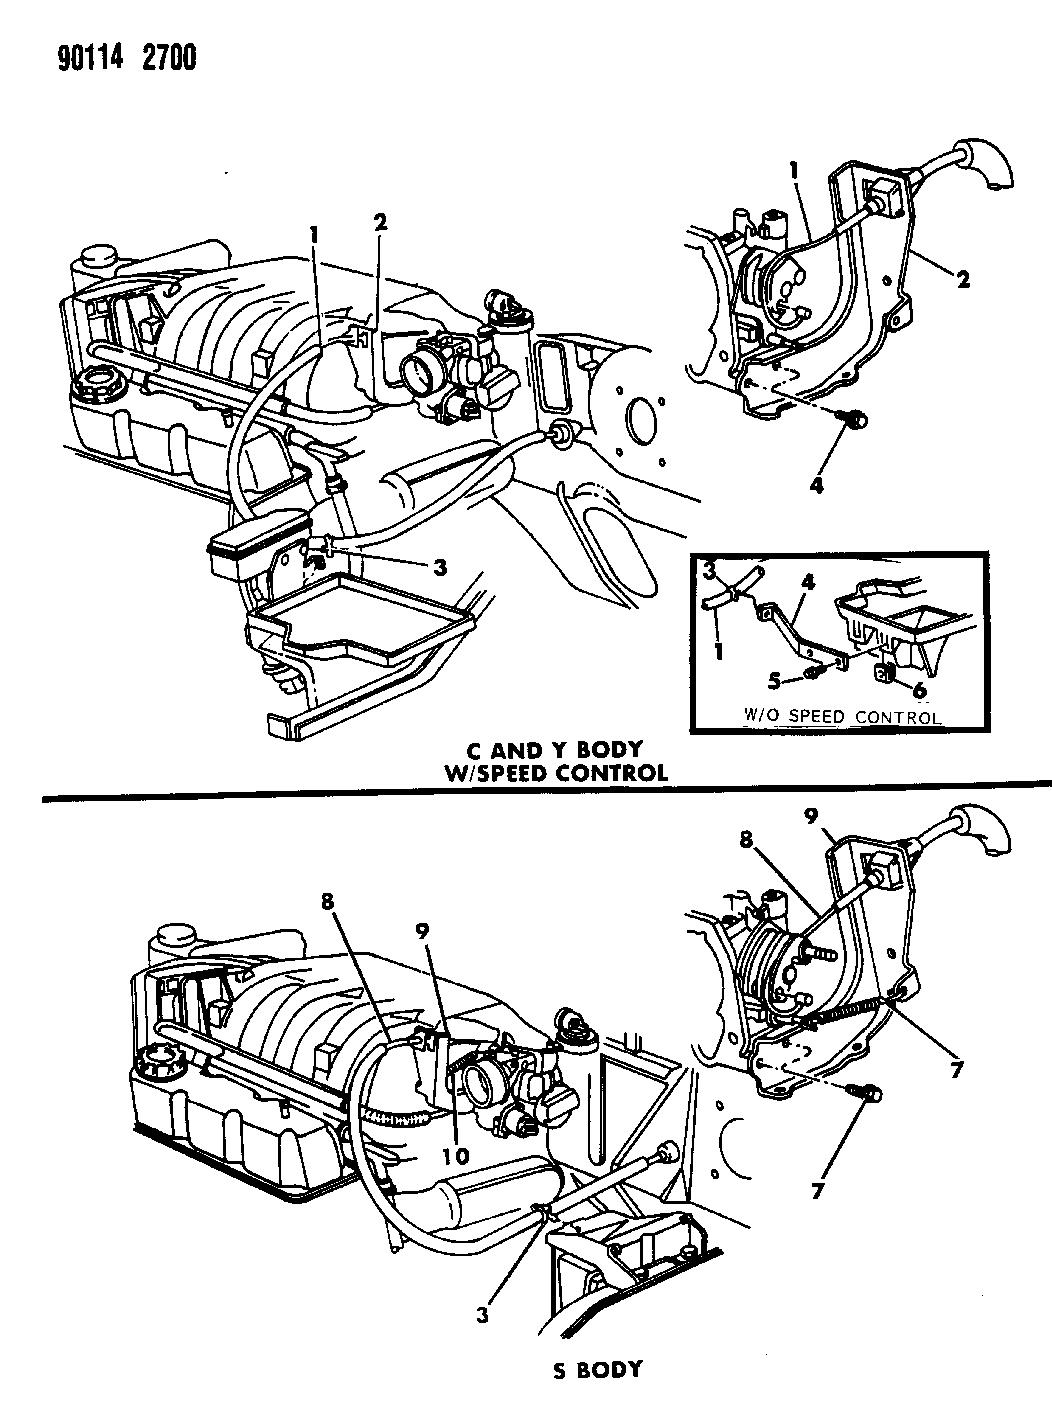 1990 chrysler new yorker fifth avenue throttle control